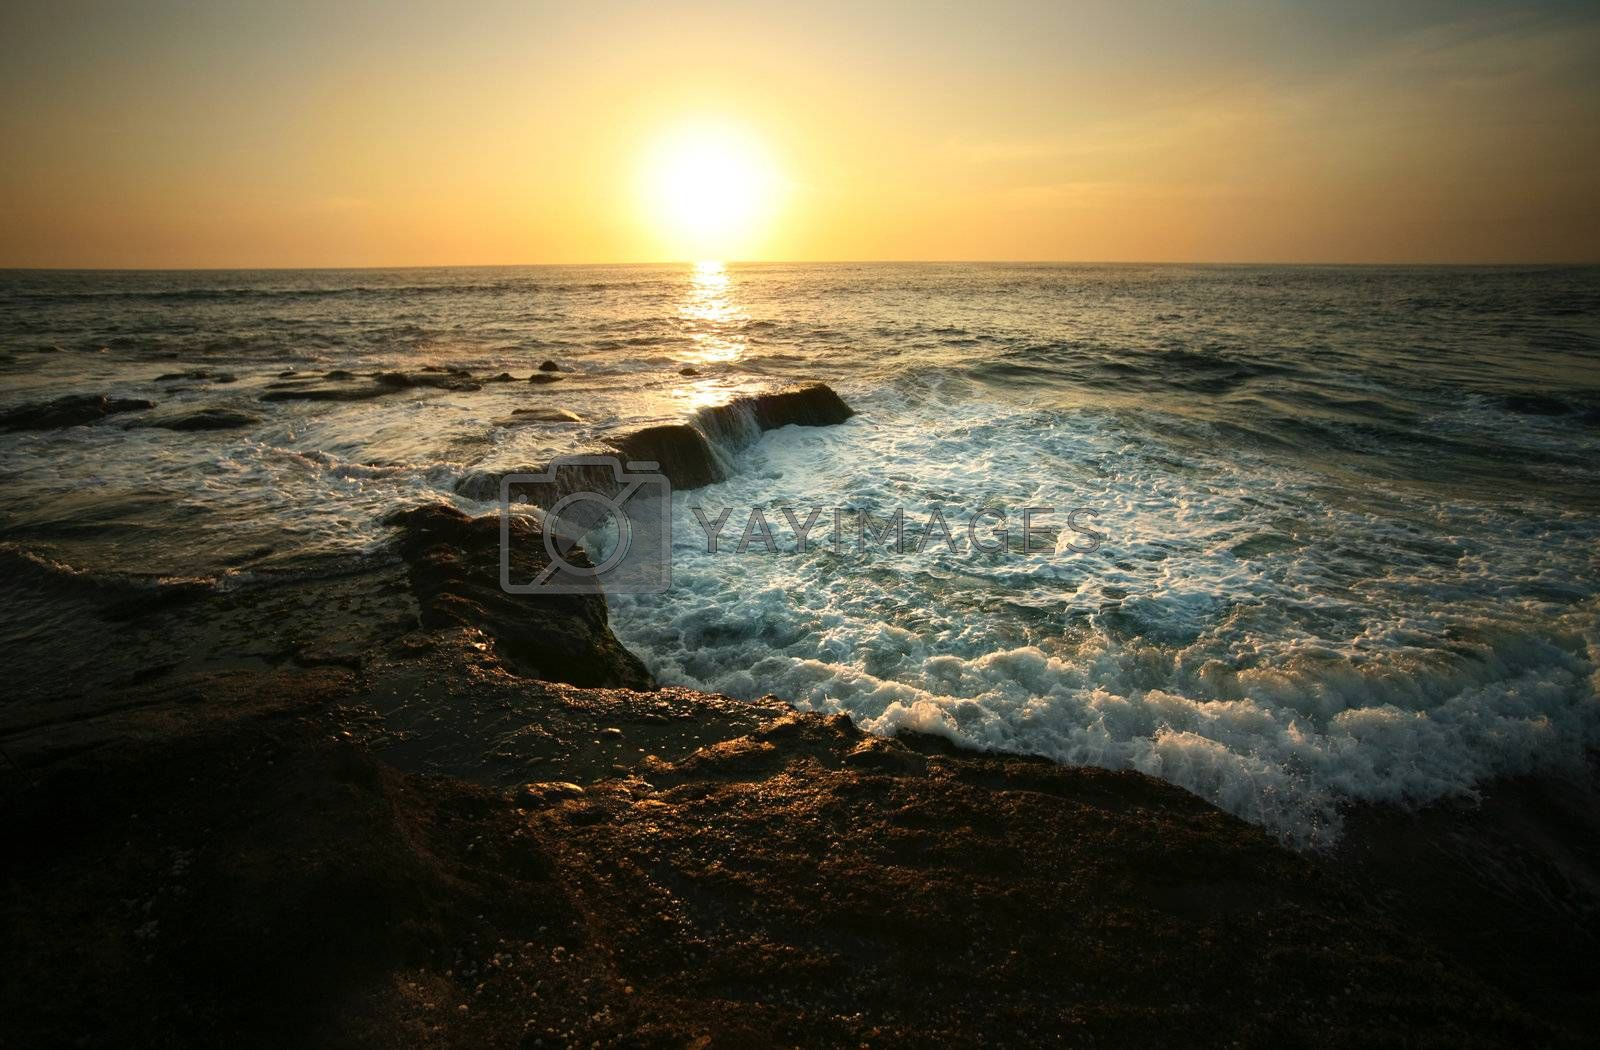 Coastline Indian ocean on sunset